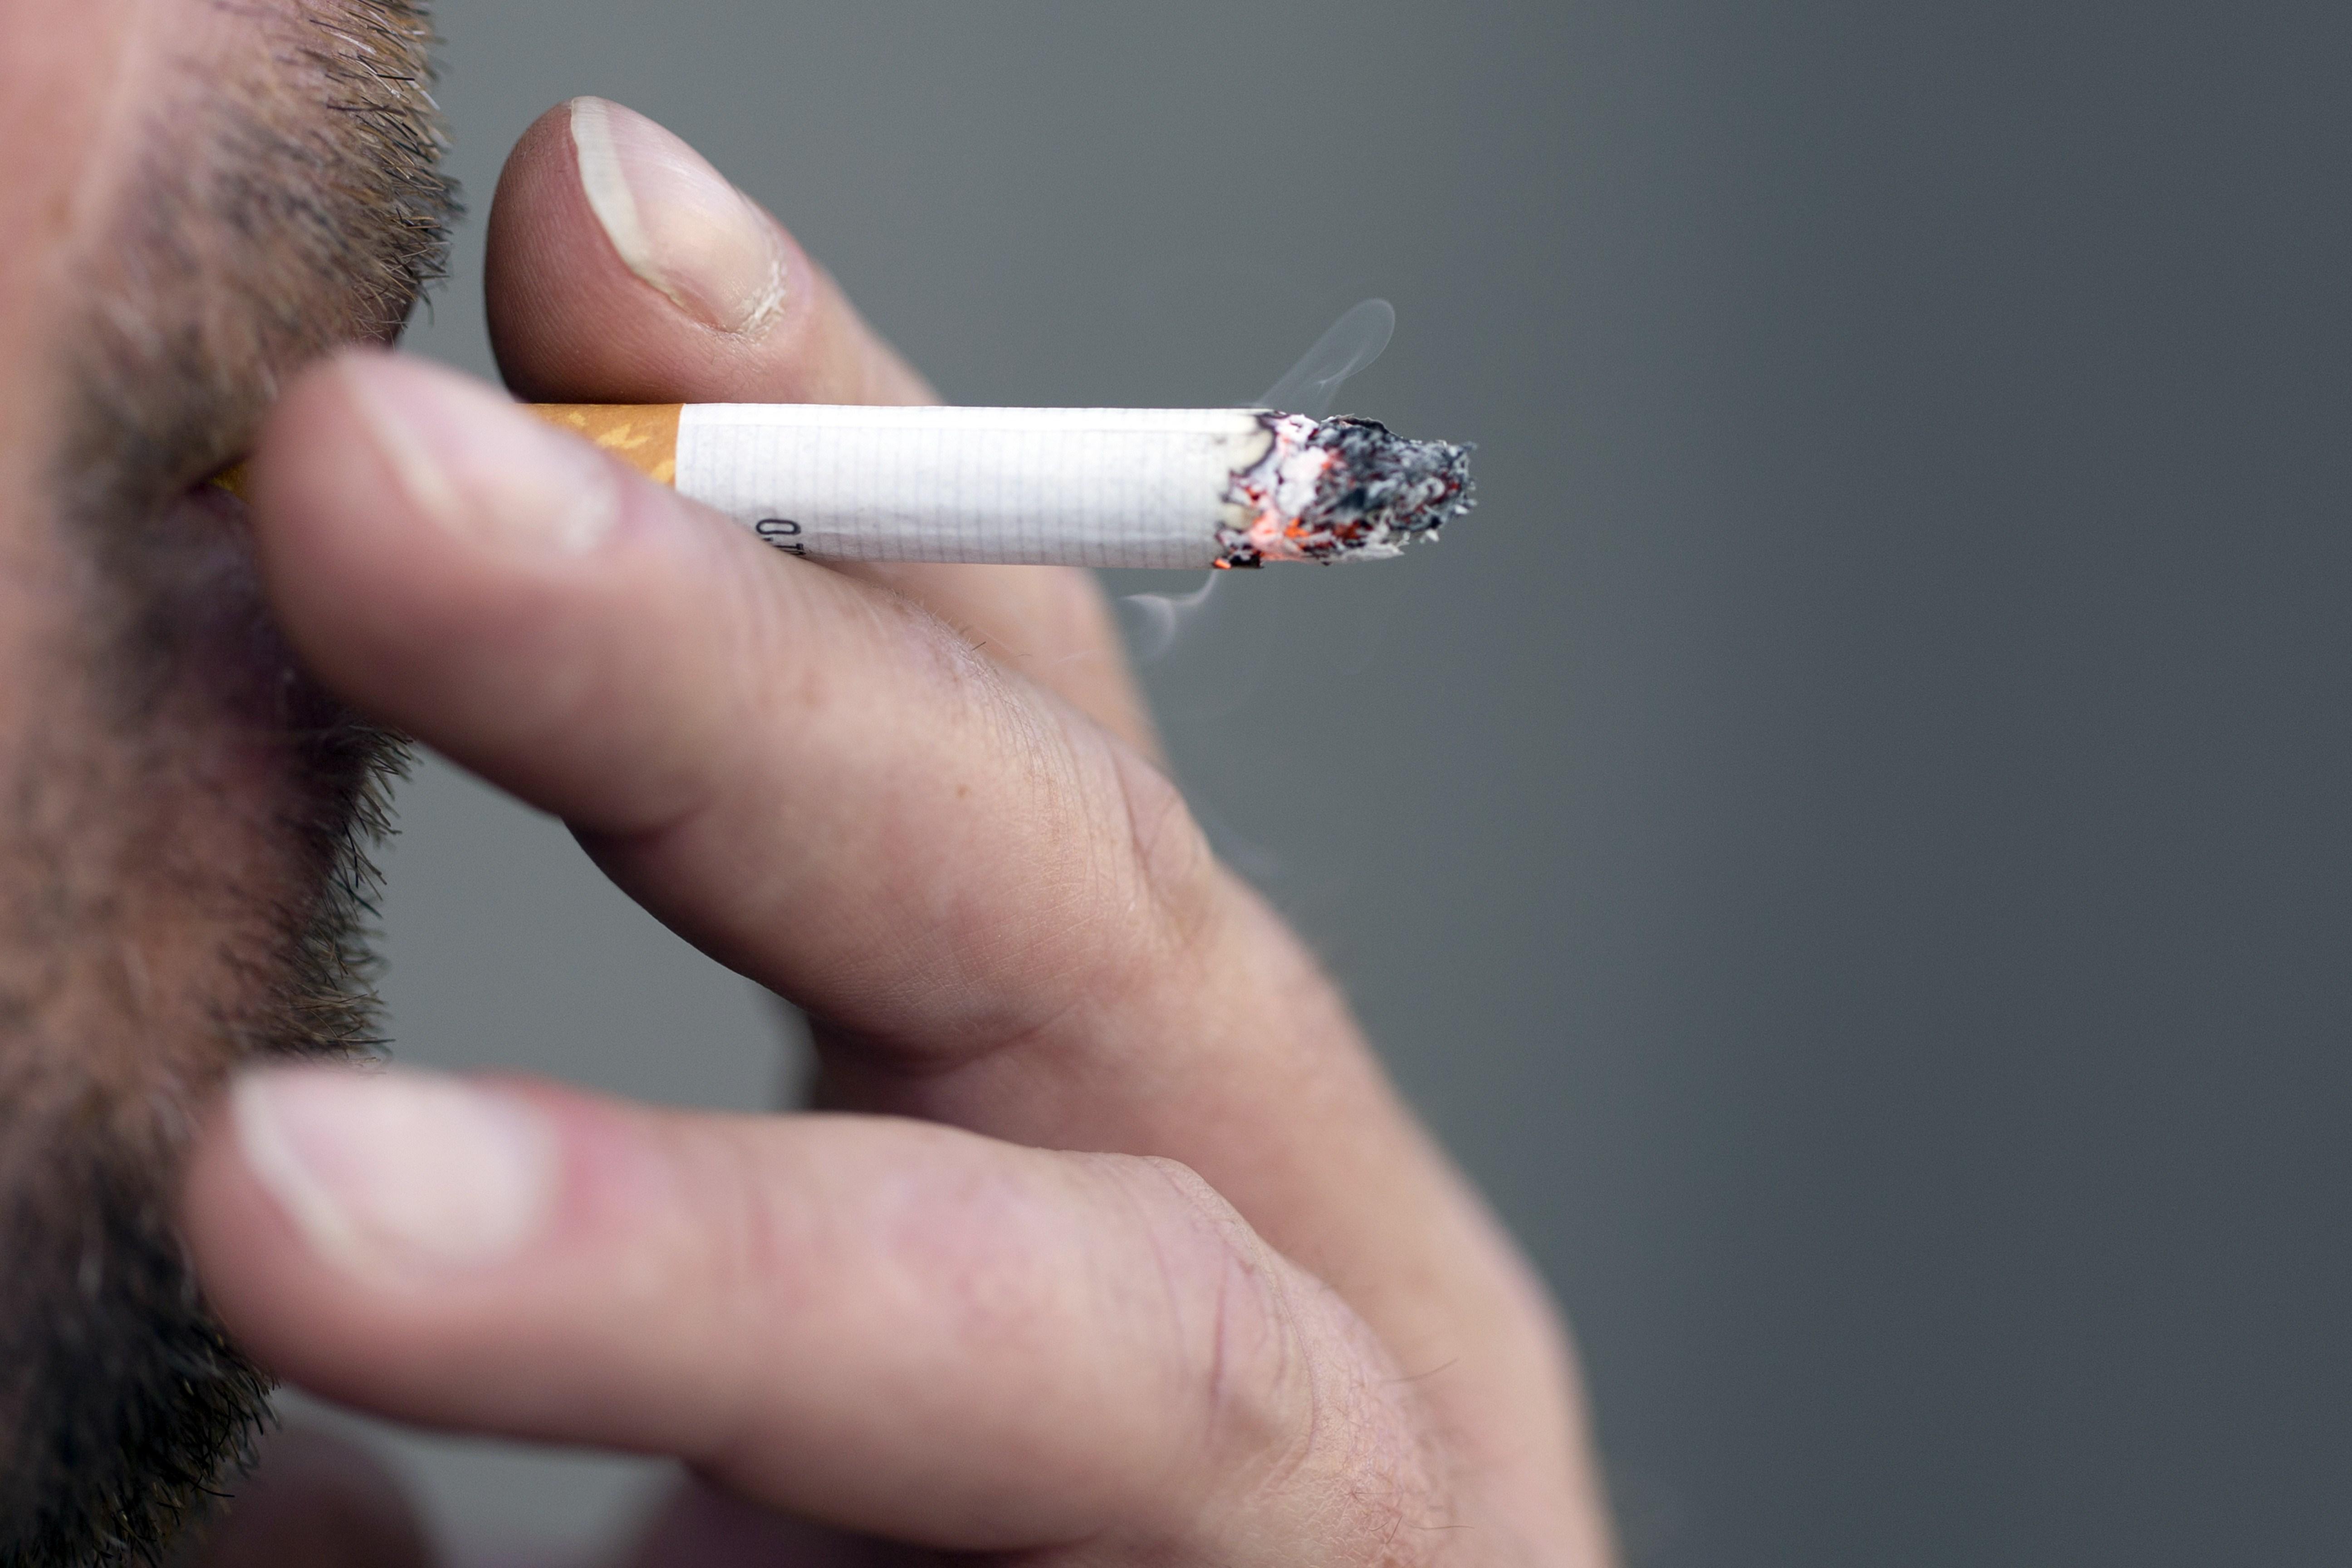 Legislator Wants To Raise Tobacco Purchasing Age To 21 In Arkansas